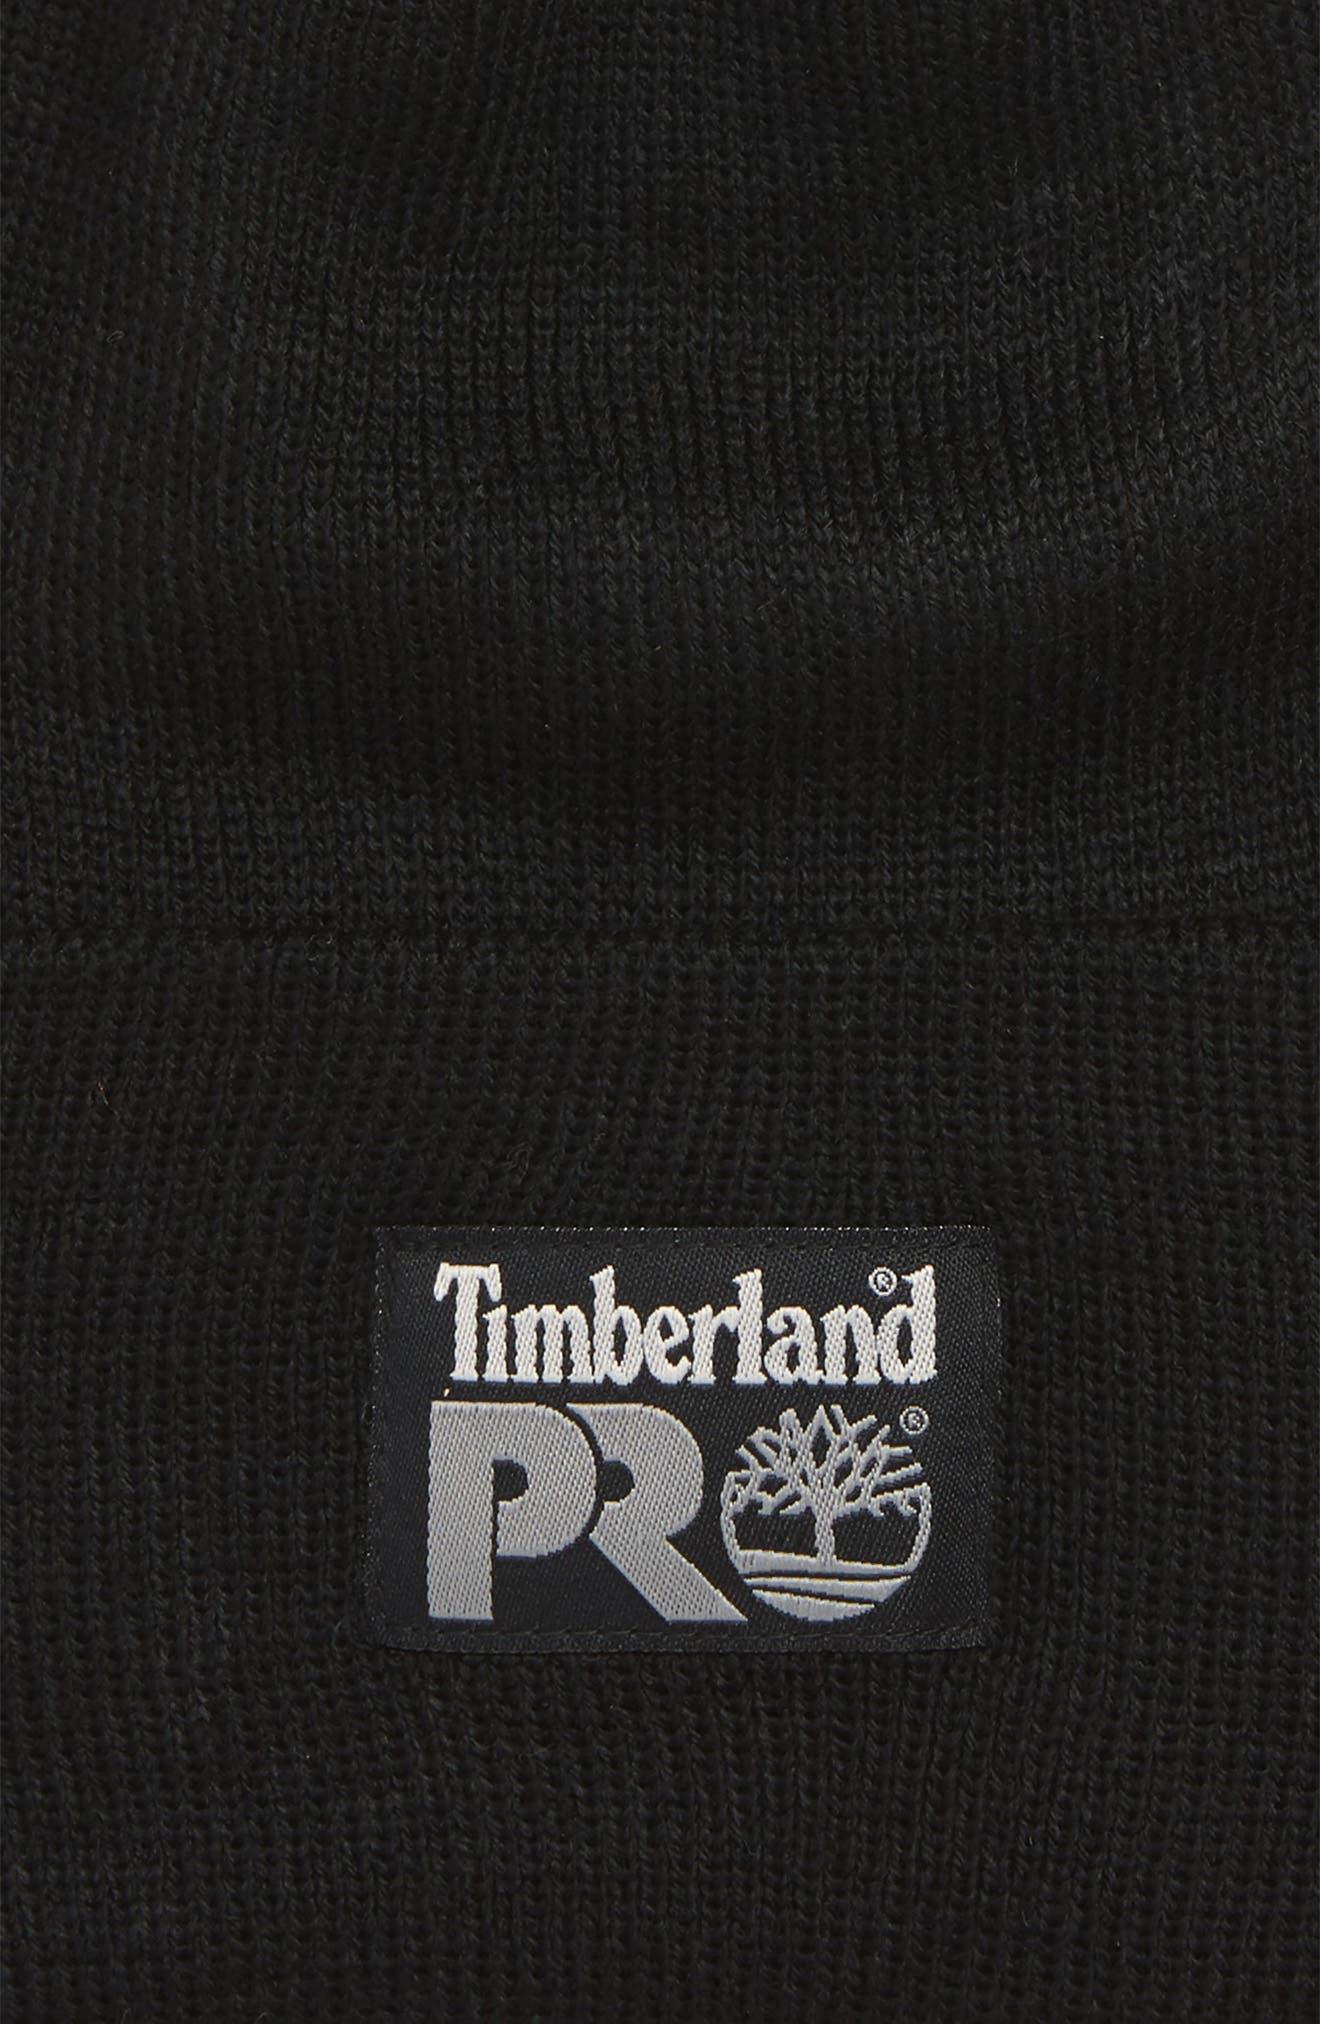 TIMBERLAND, Pro Logo Patch Beanie, Alternate thumbnail 2, color, BLACK